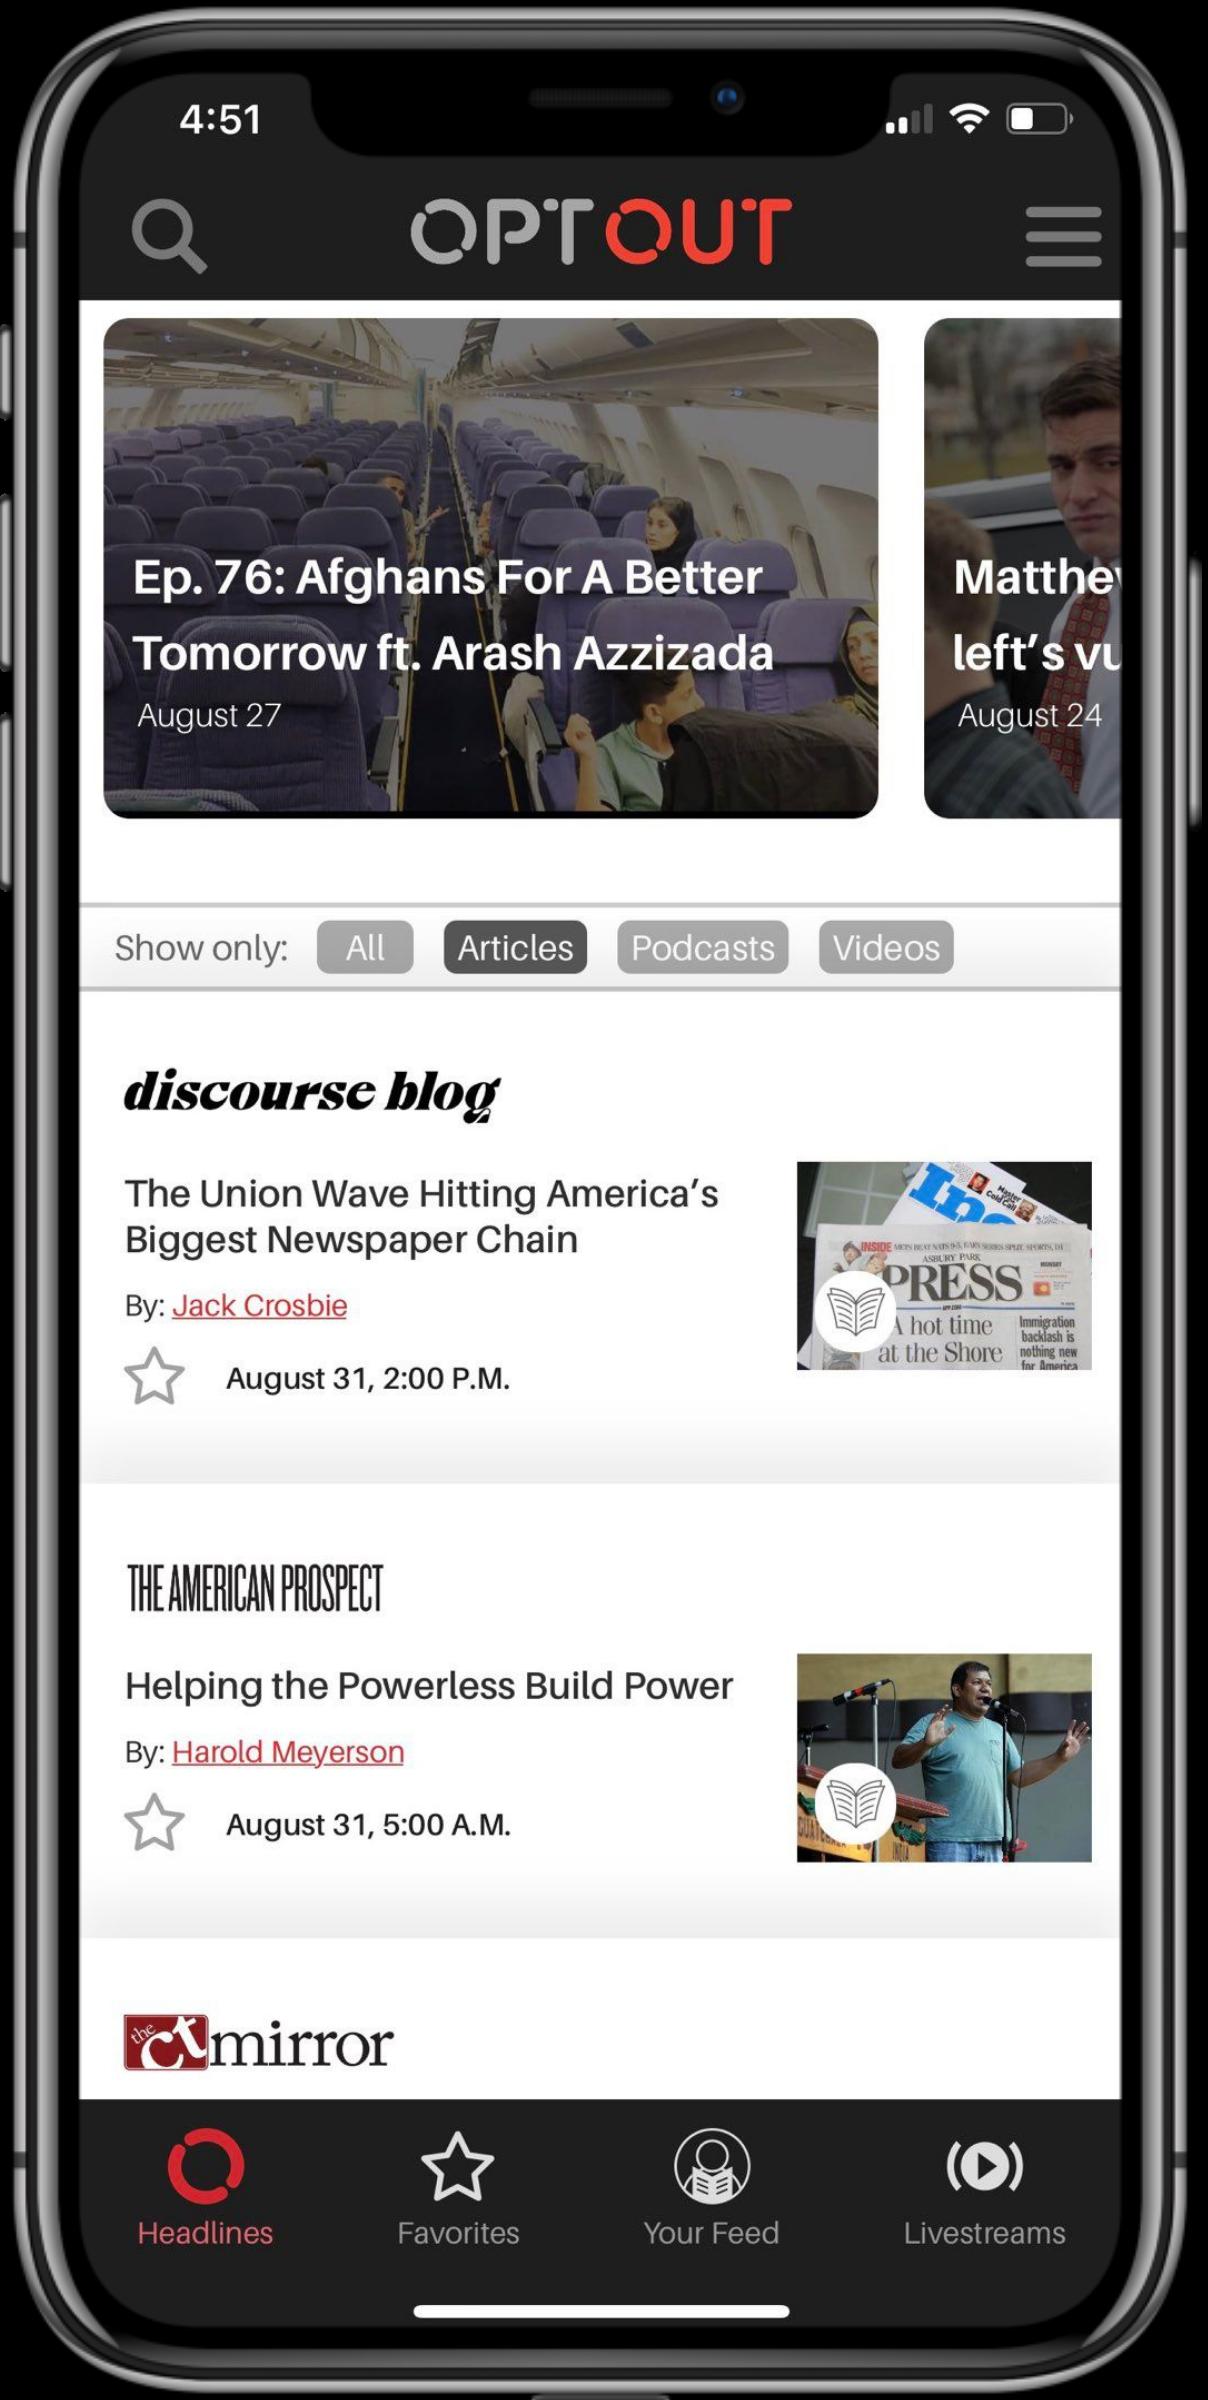 image of OptOut app on phone